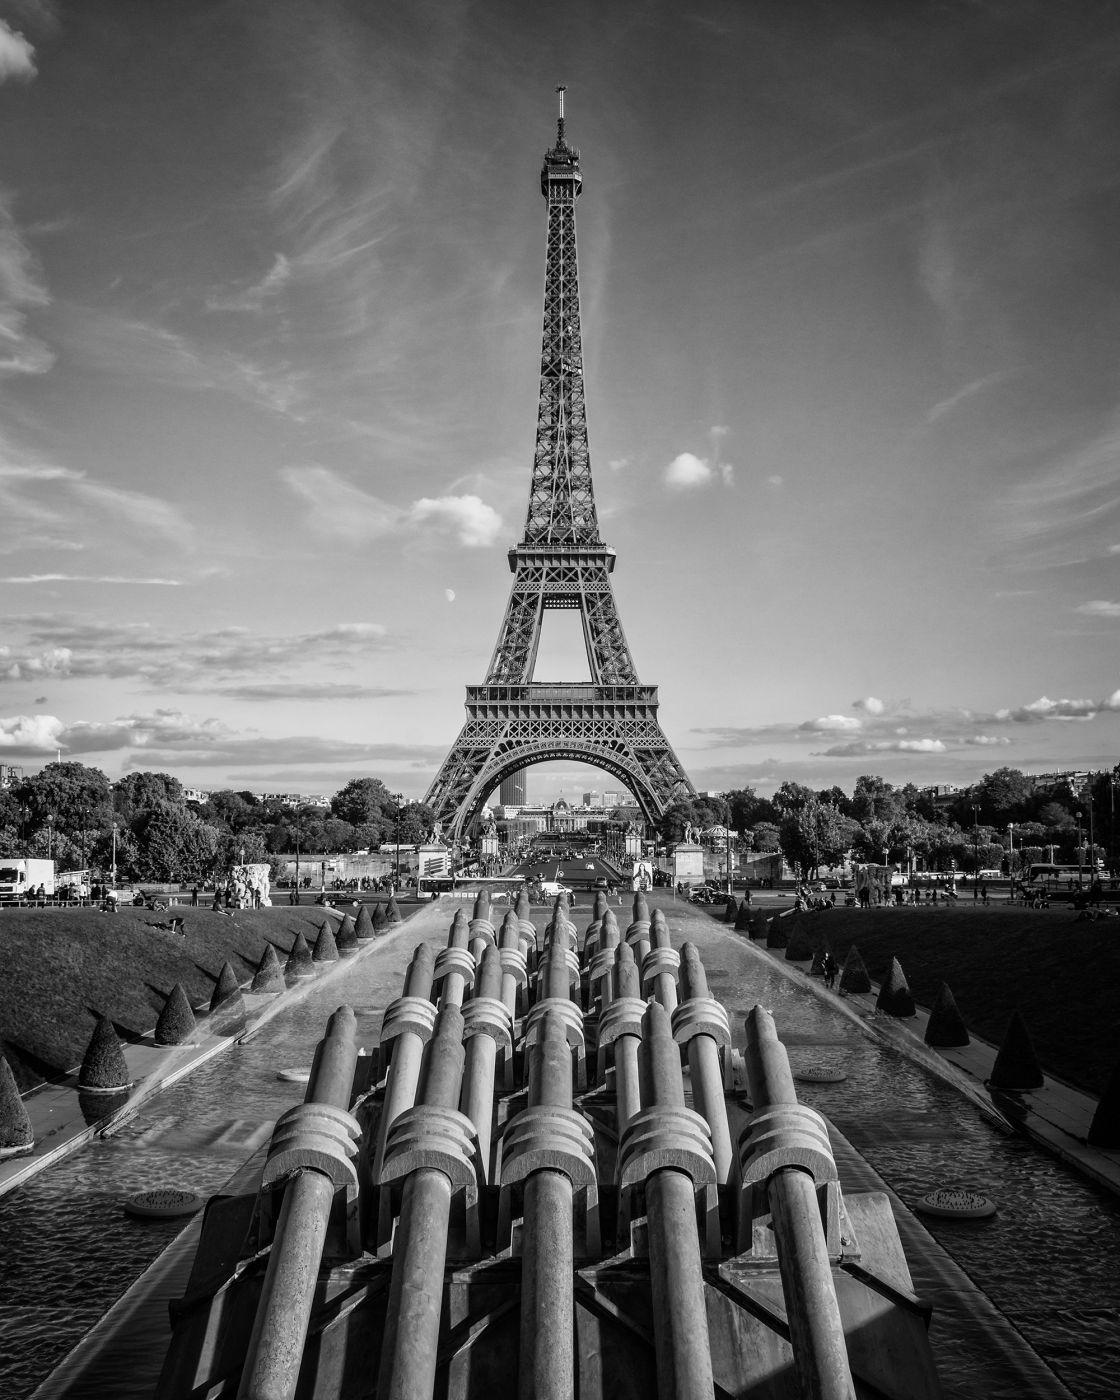 Tour Eiffel from Trocadéro, France